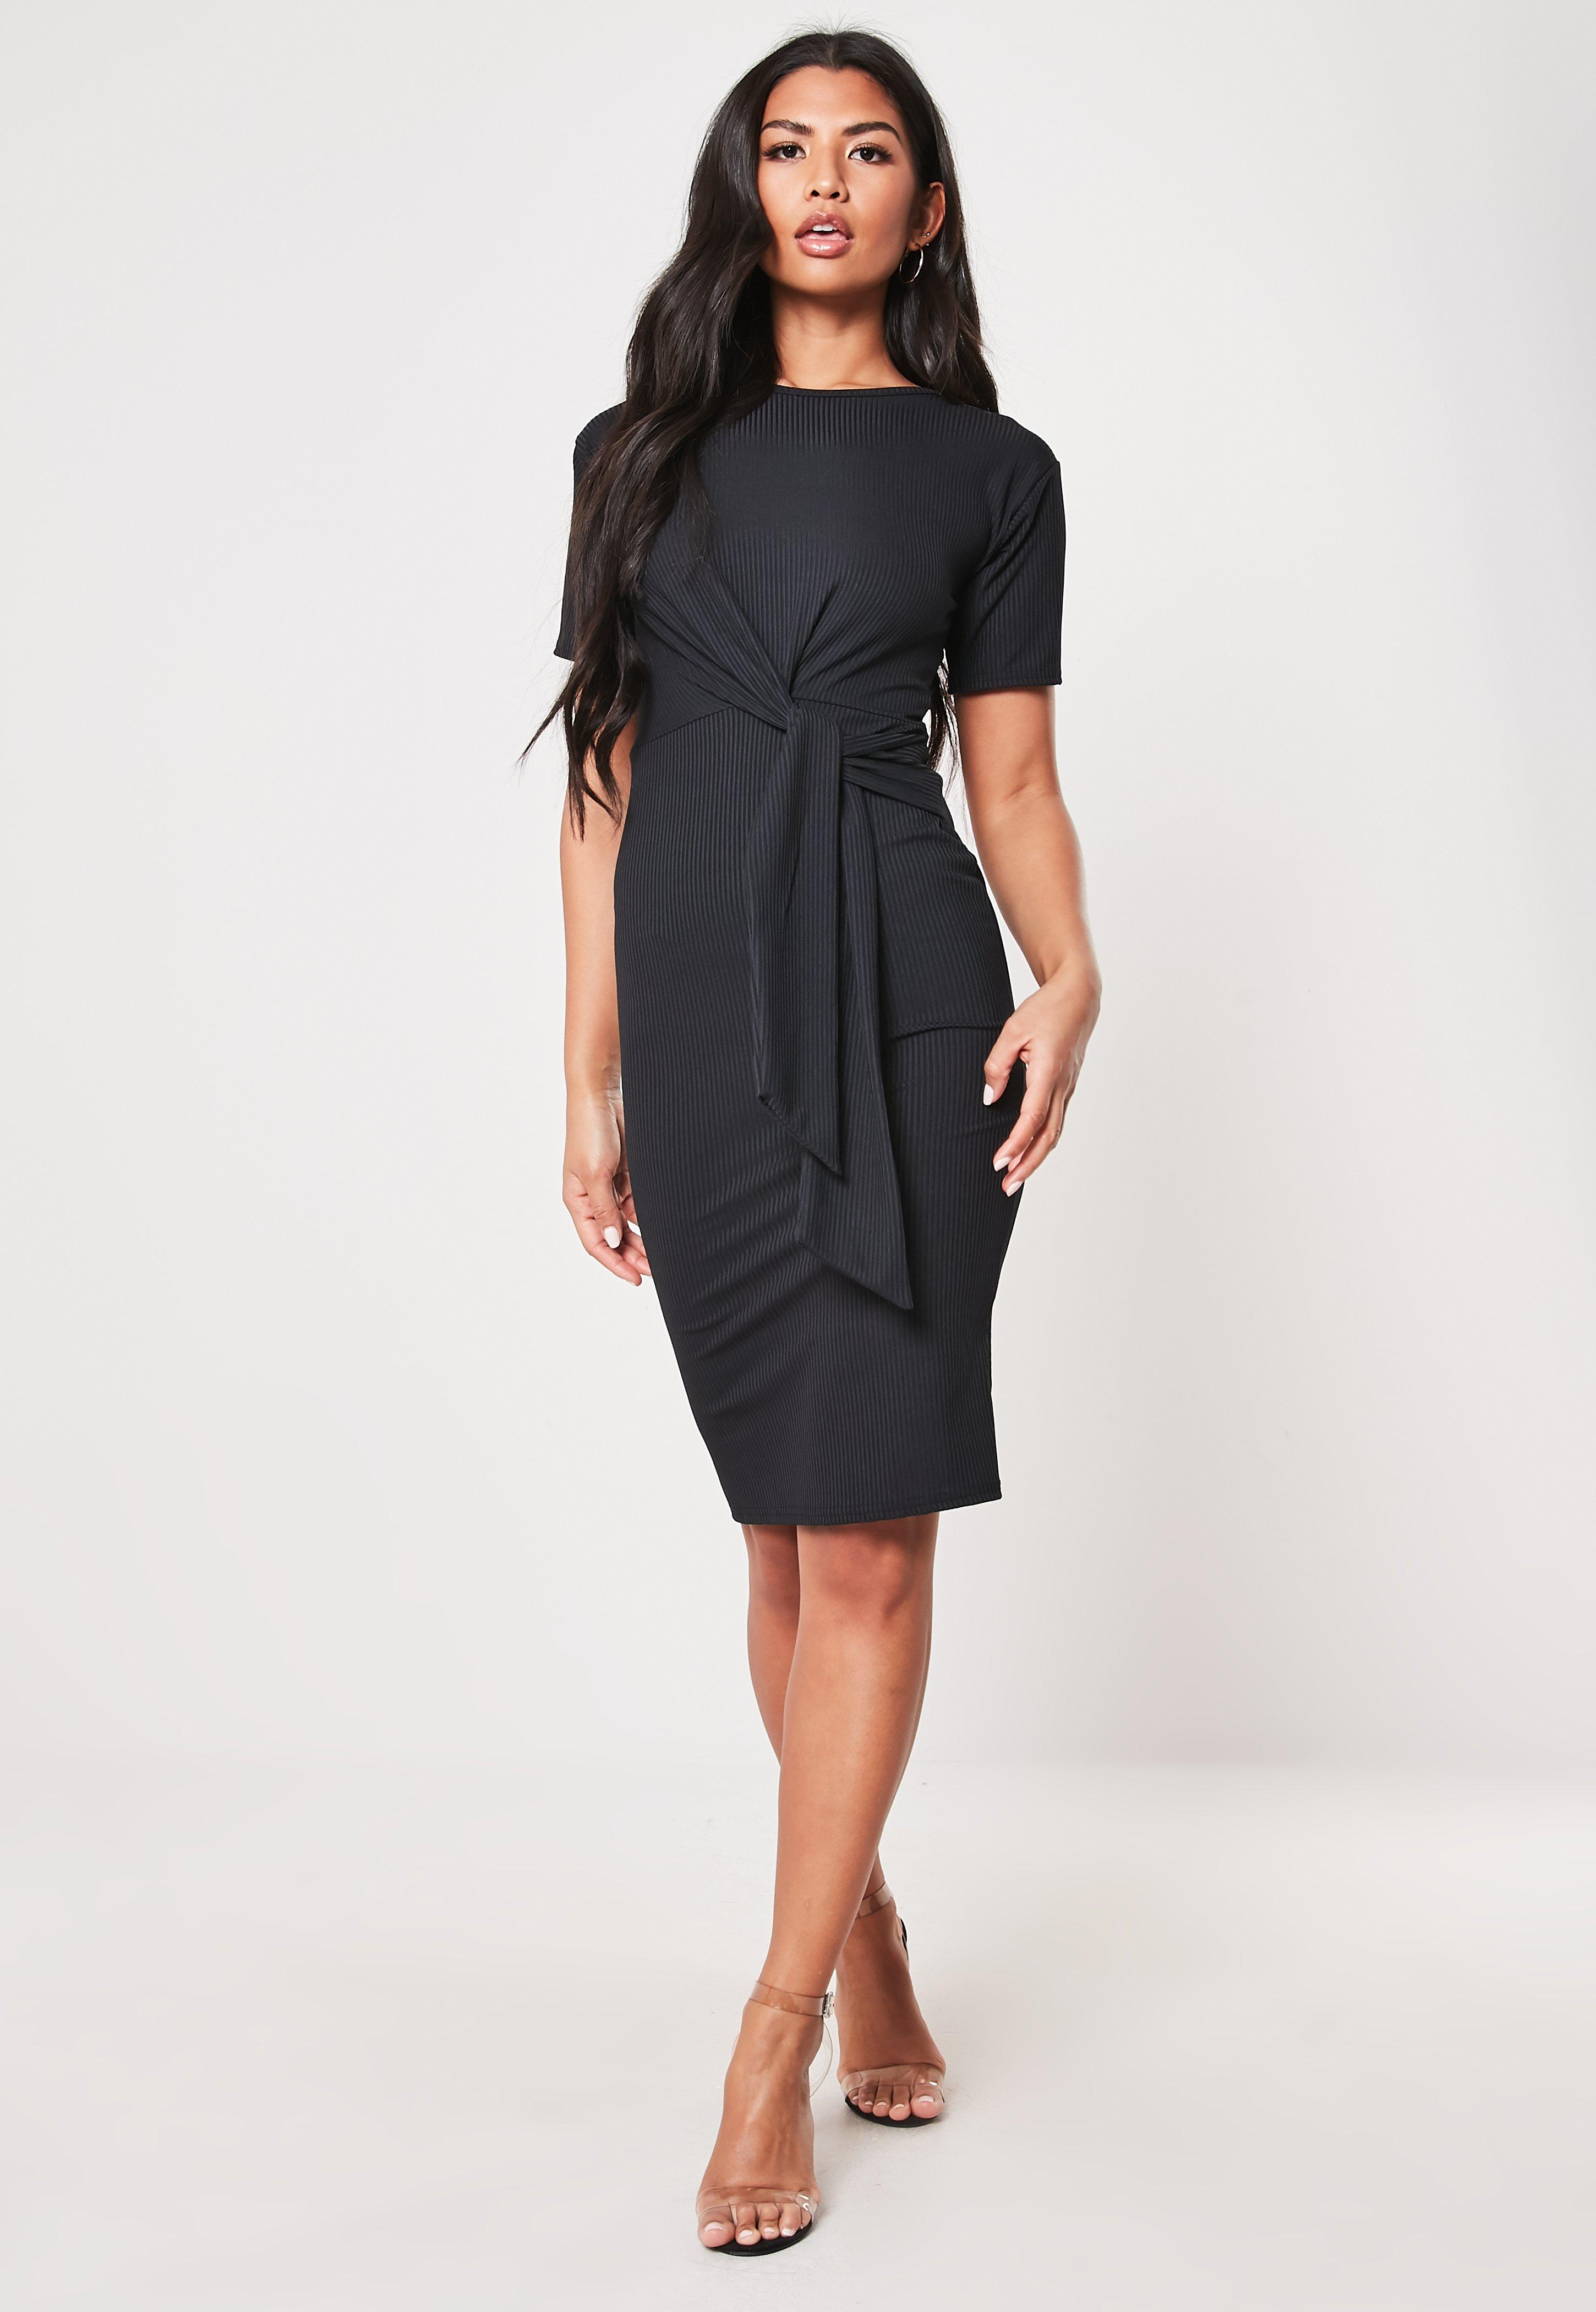 c66c6e820043d Evening Formal Dresses Online